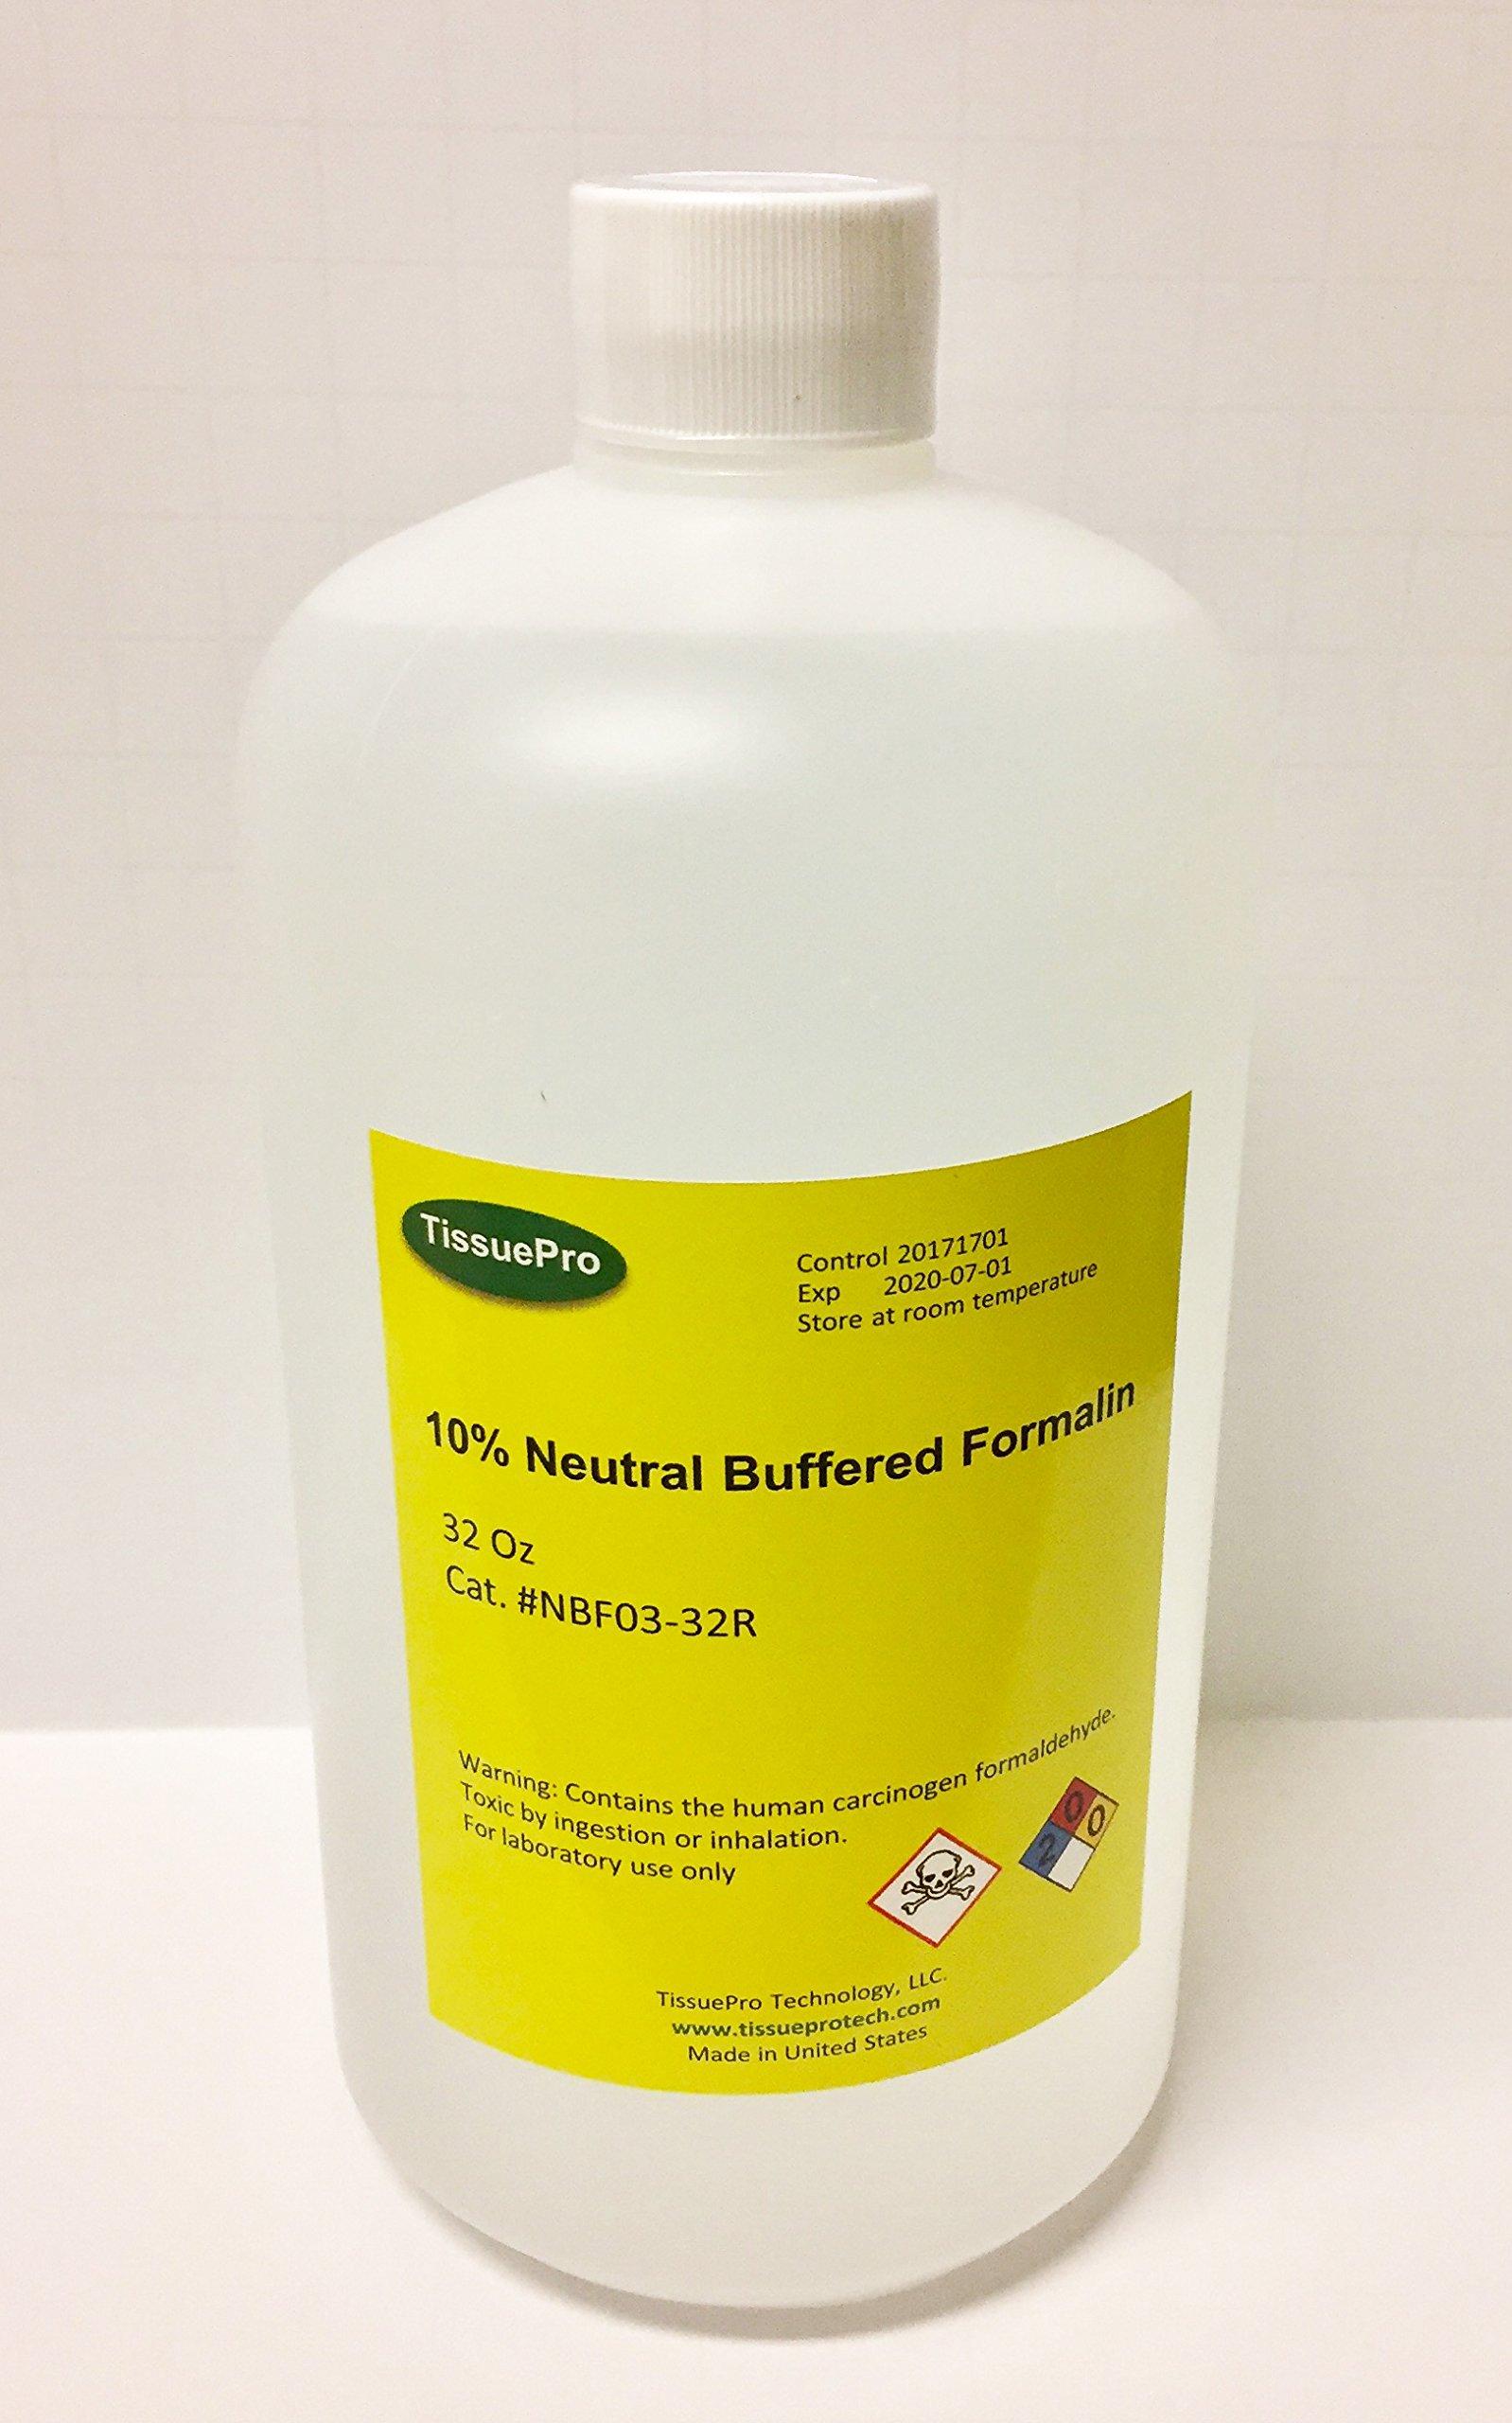 Neutral Buffered Formalin